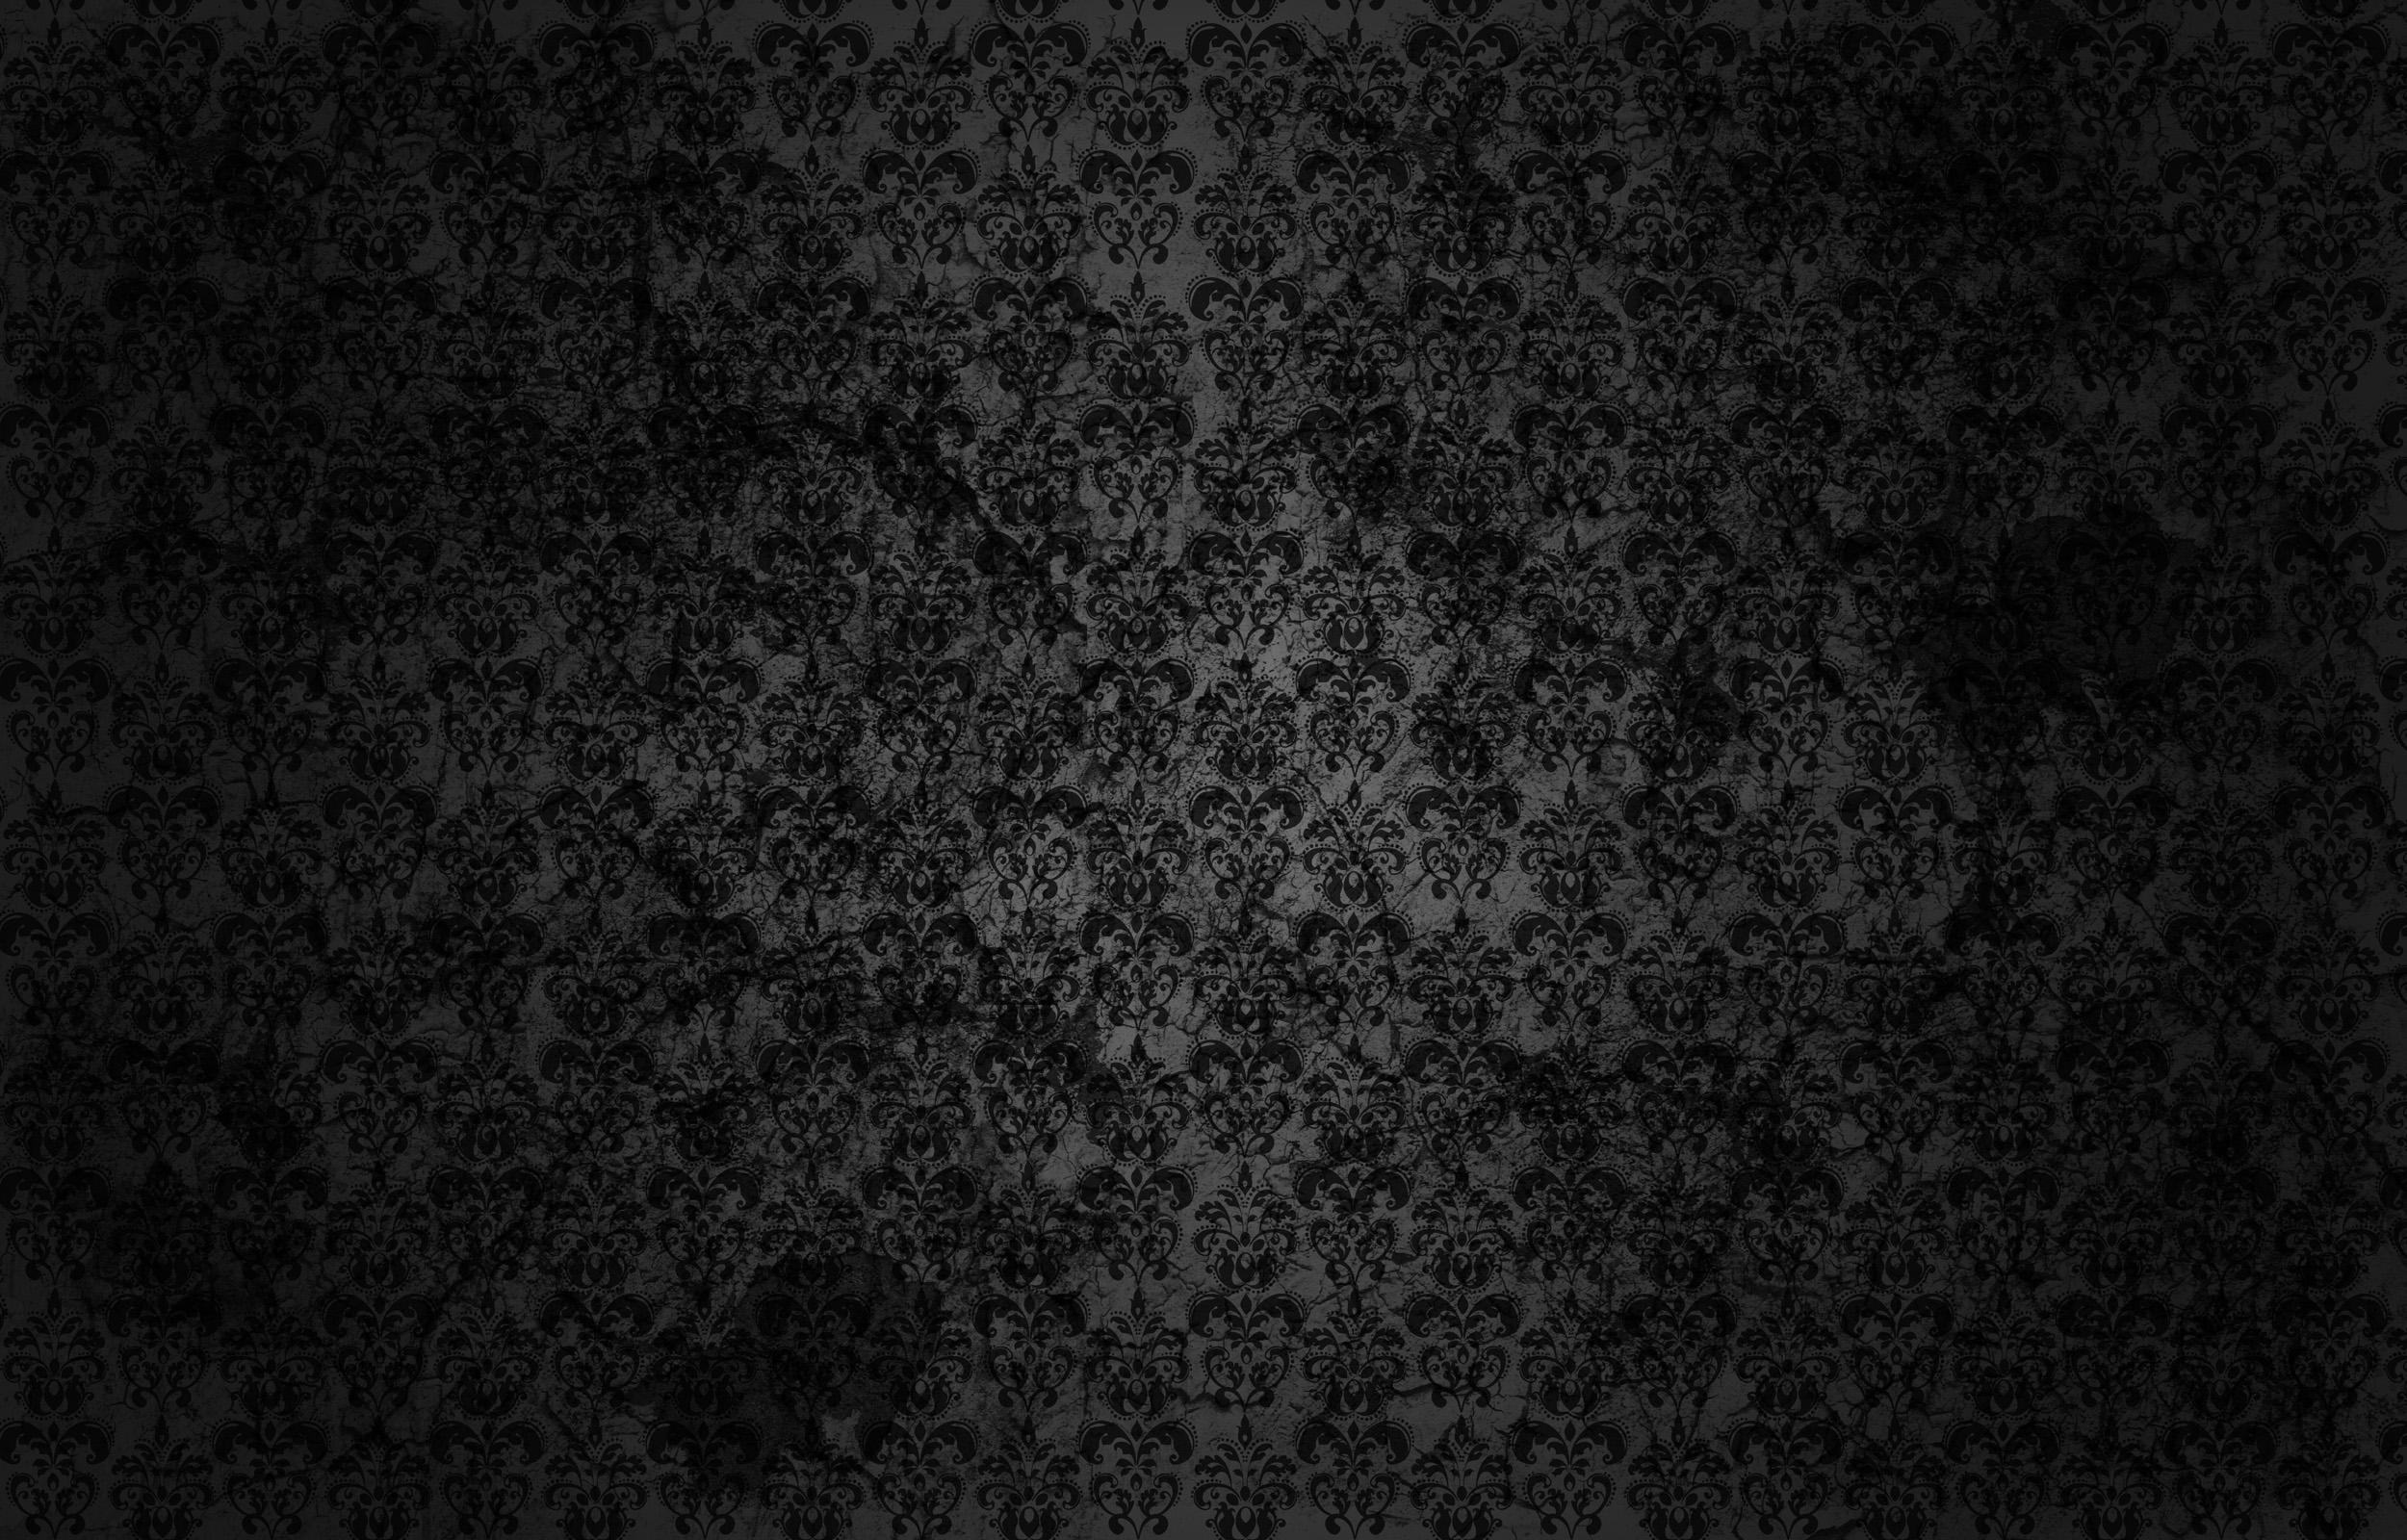 Black vintage background lilz eu tattoo de Black Background and some 2500x1600